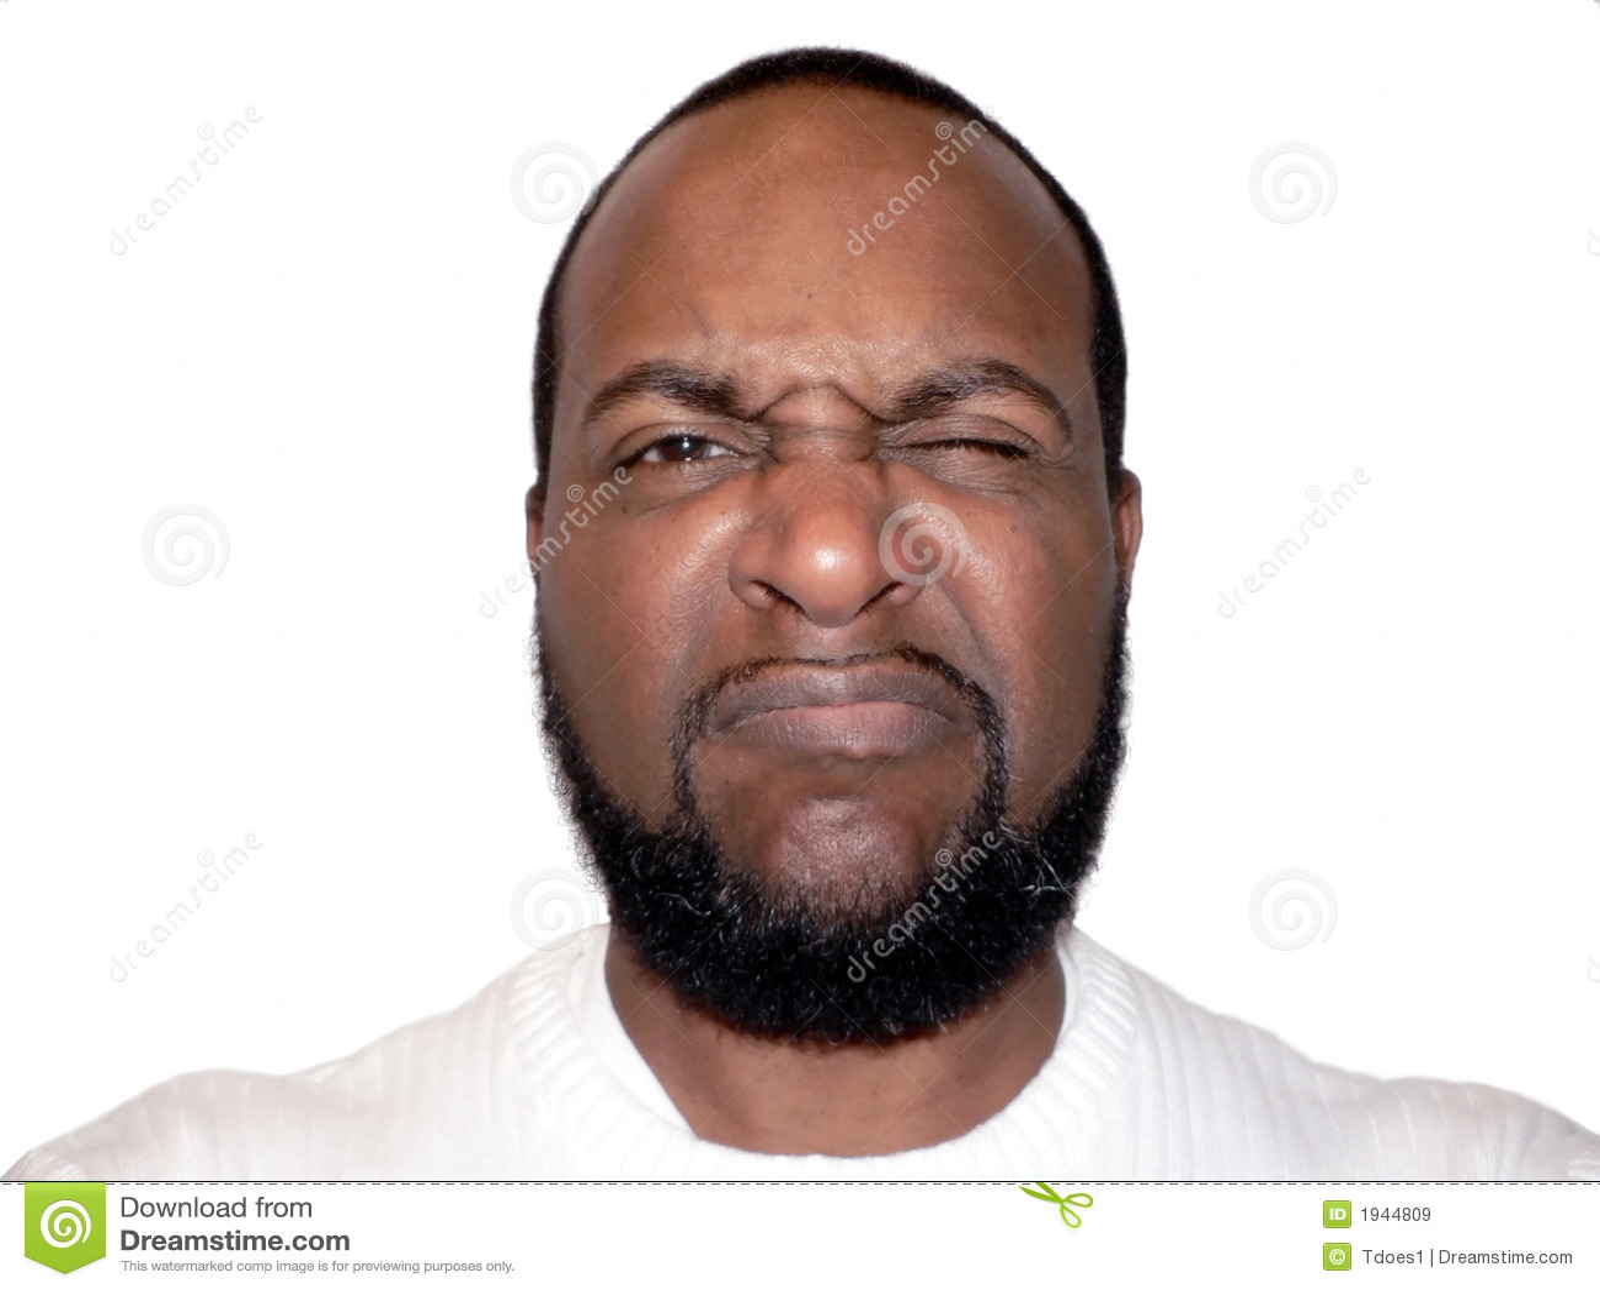 Facial expression - frown